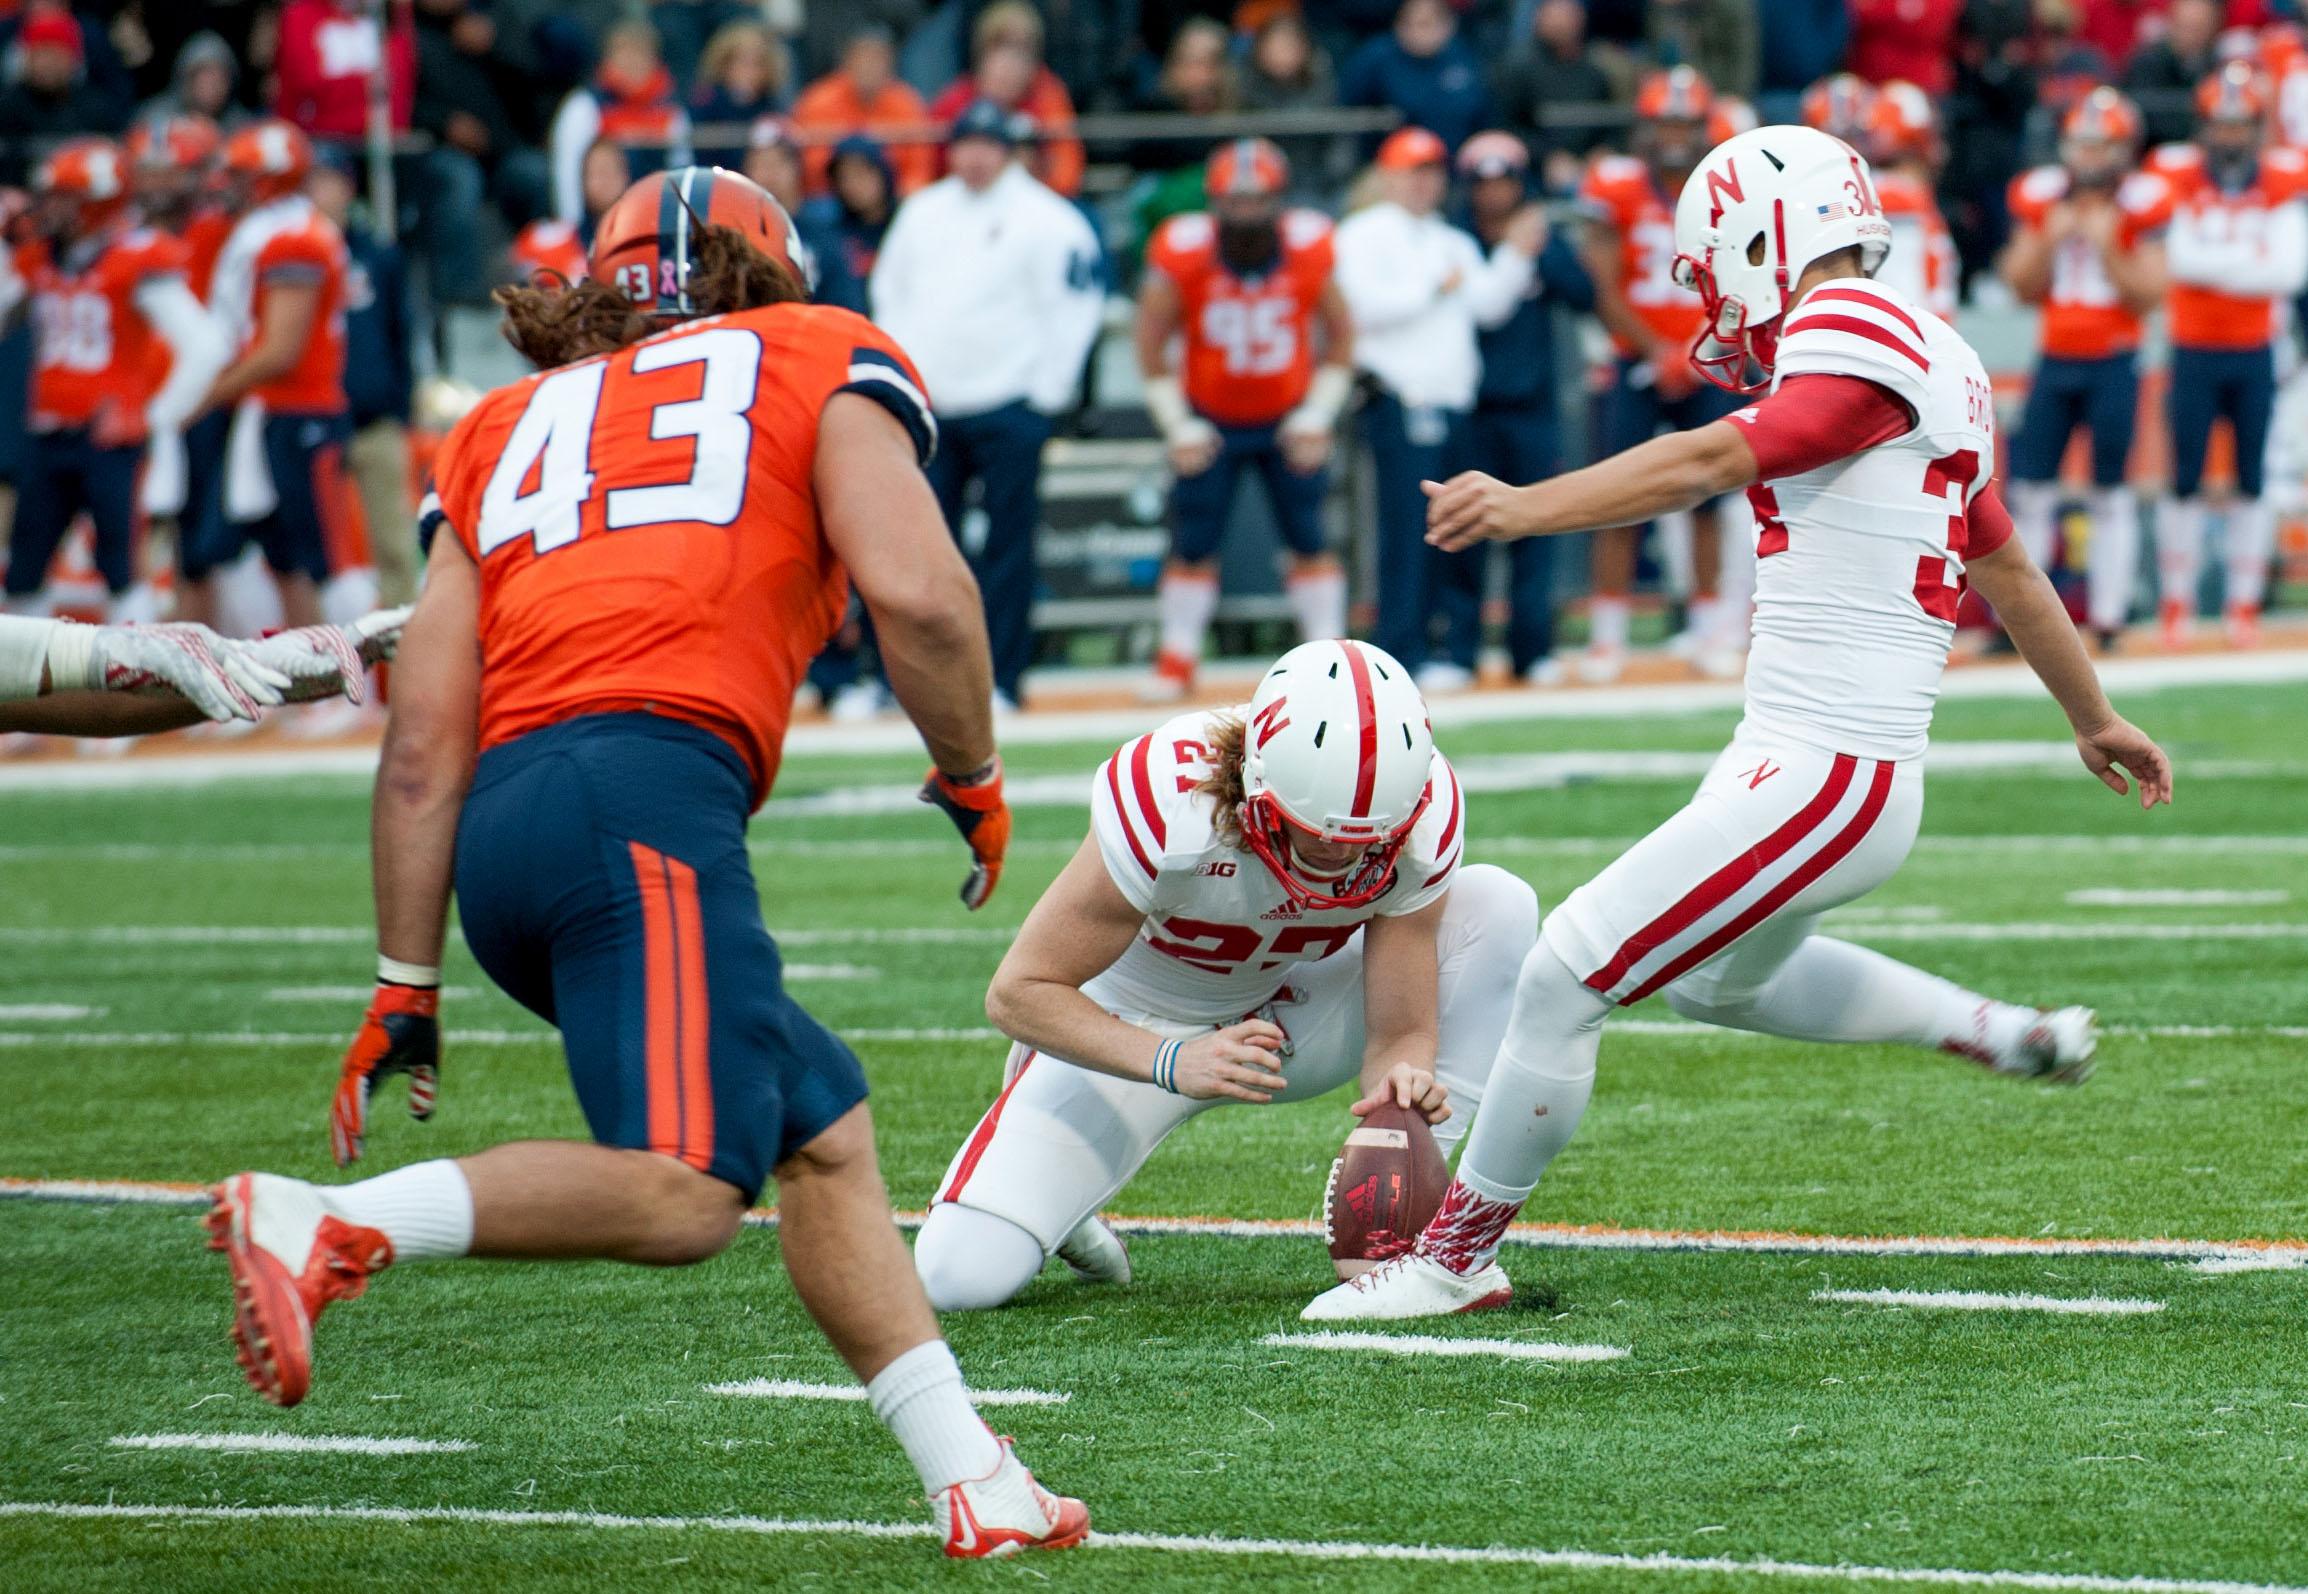 Nebraska place kicker Drew Brown (34) kicks a field goal during the second half of an NCAA college football game Saturday, Oct. 3, 2015, in Champaign, Ill.  Illinois won 14-13. (AP Photo/Bradley Leeb)